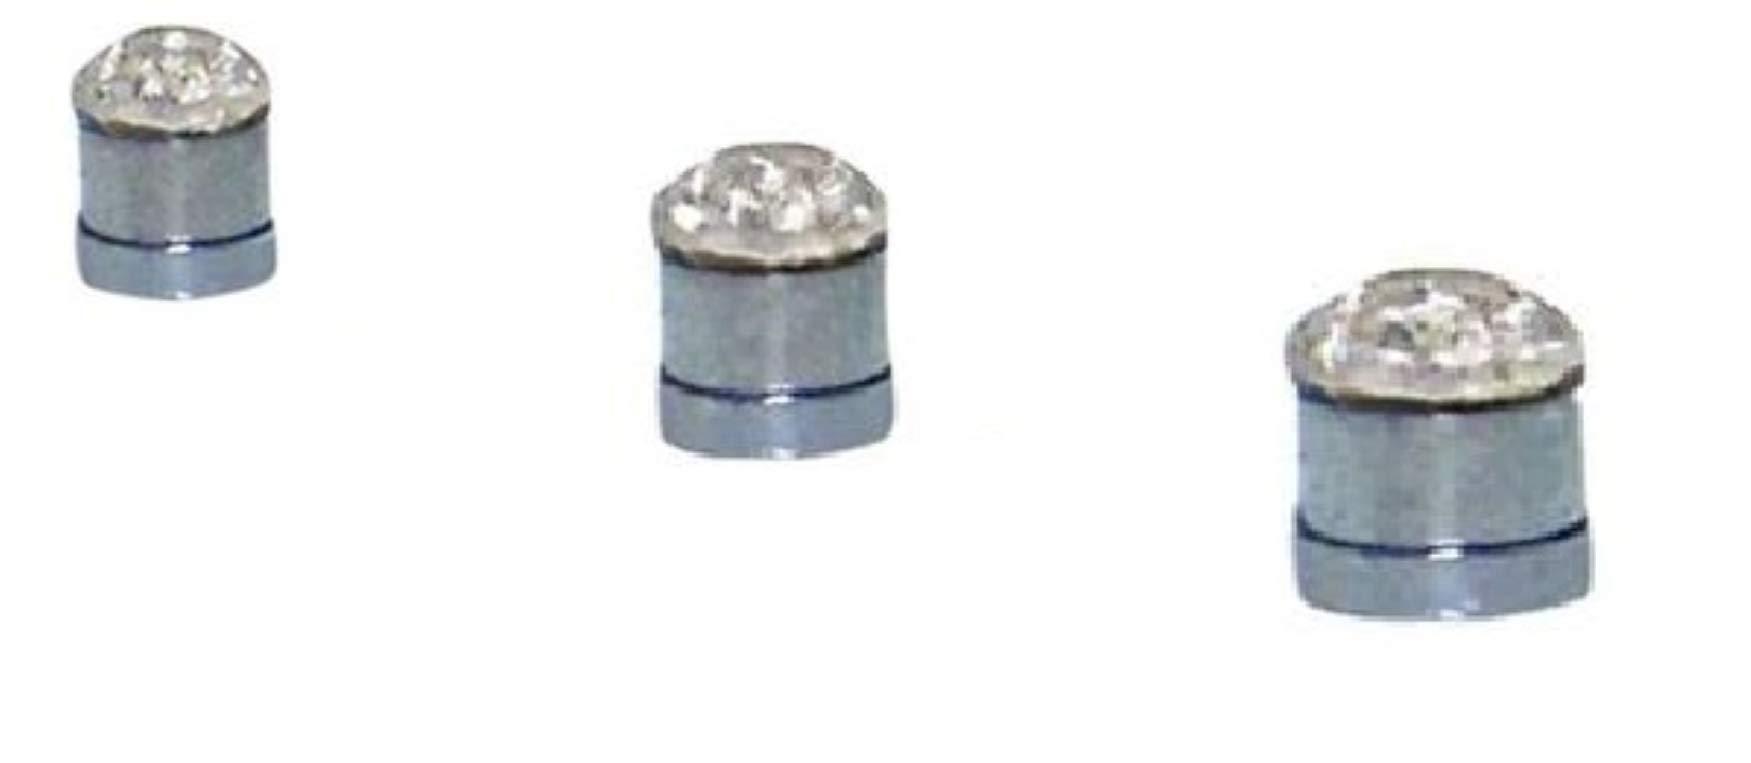 6pcs Round CZ Magnetic Earrings Stud Nose Rings No Piercing 2mm 3mm 4mm Each Package Earrings (clear 6)